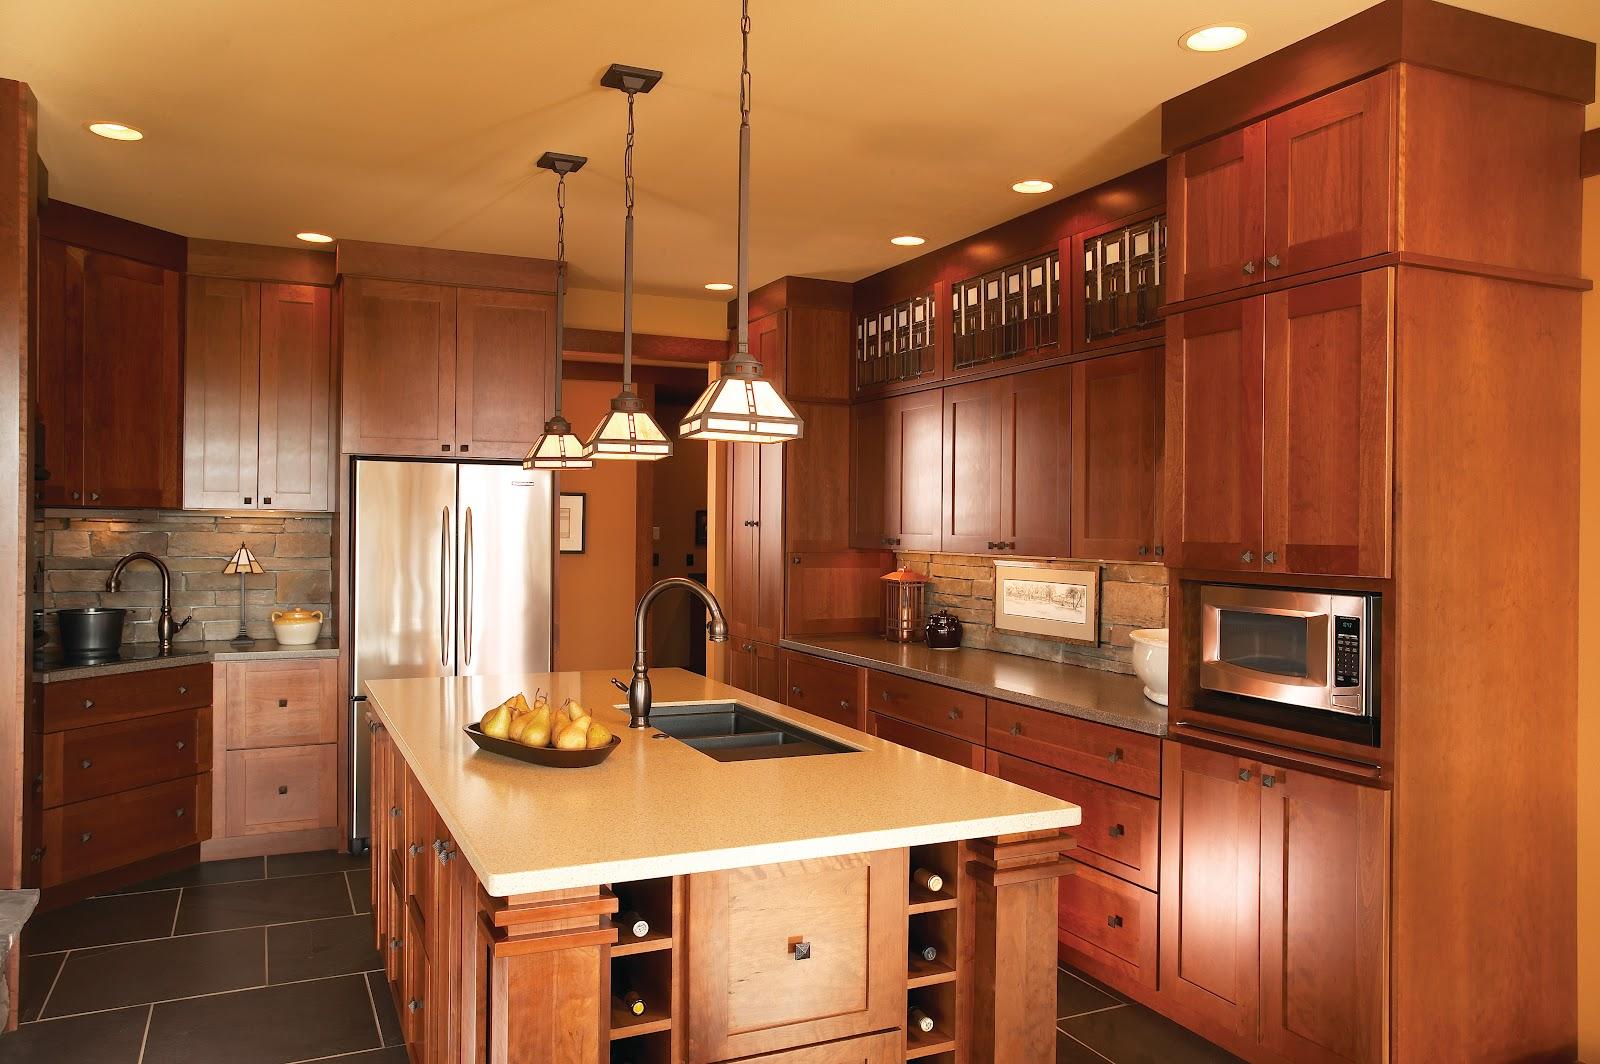 cabinetcottageinc kitchen kompact cabinets reviews Woodharbor